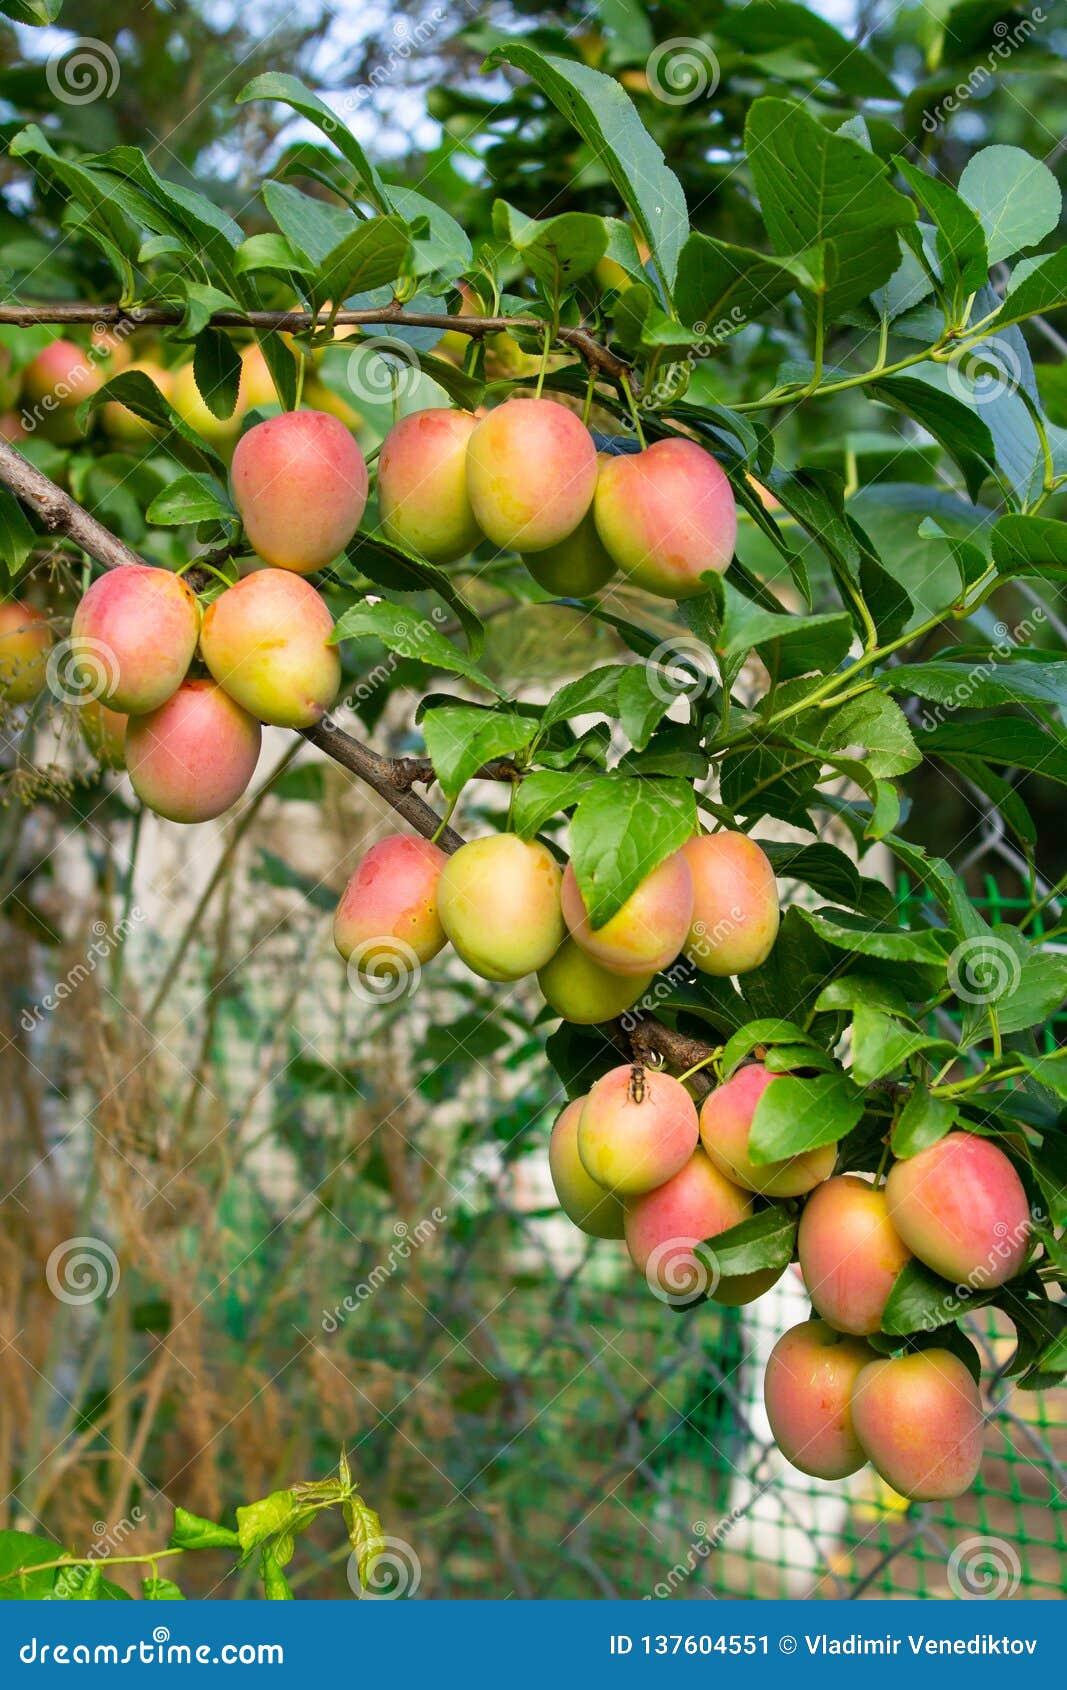 Ripe plum on a branch close-up